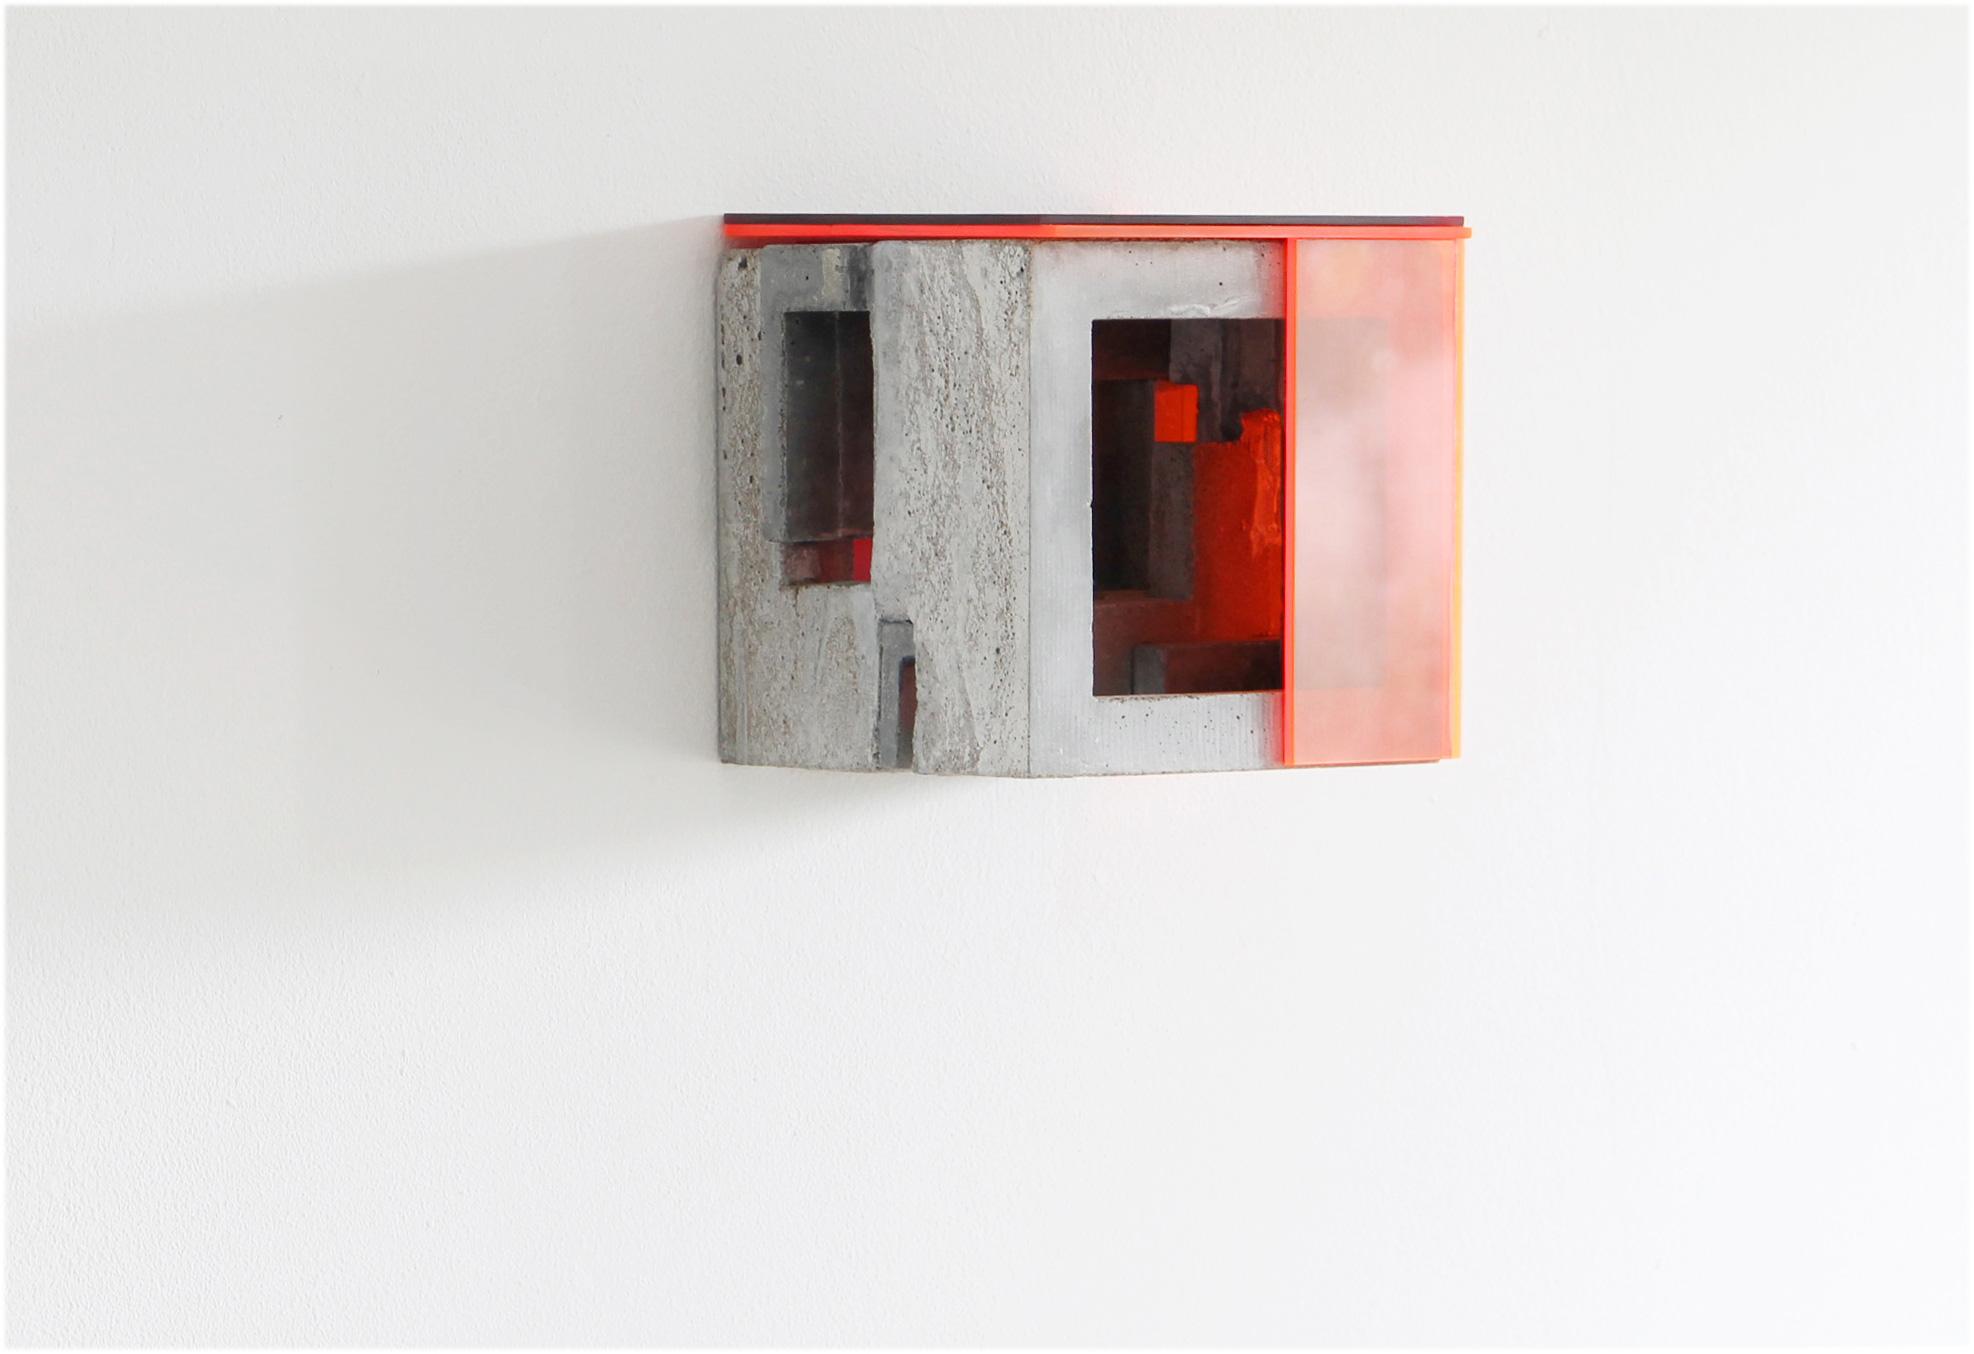 Box X/5 | 2020 | Beton , Acrylglas | 14 x 14 x 14 cm